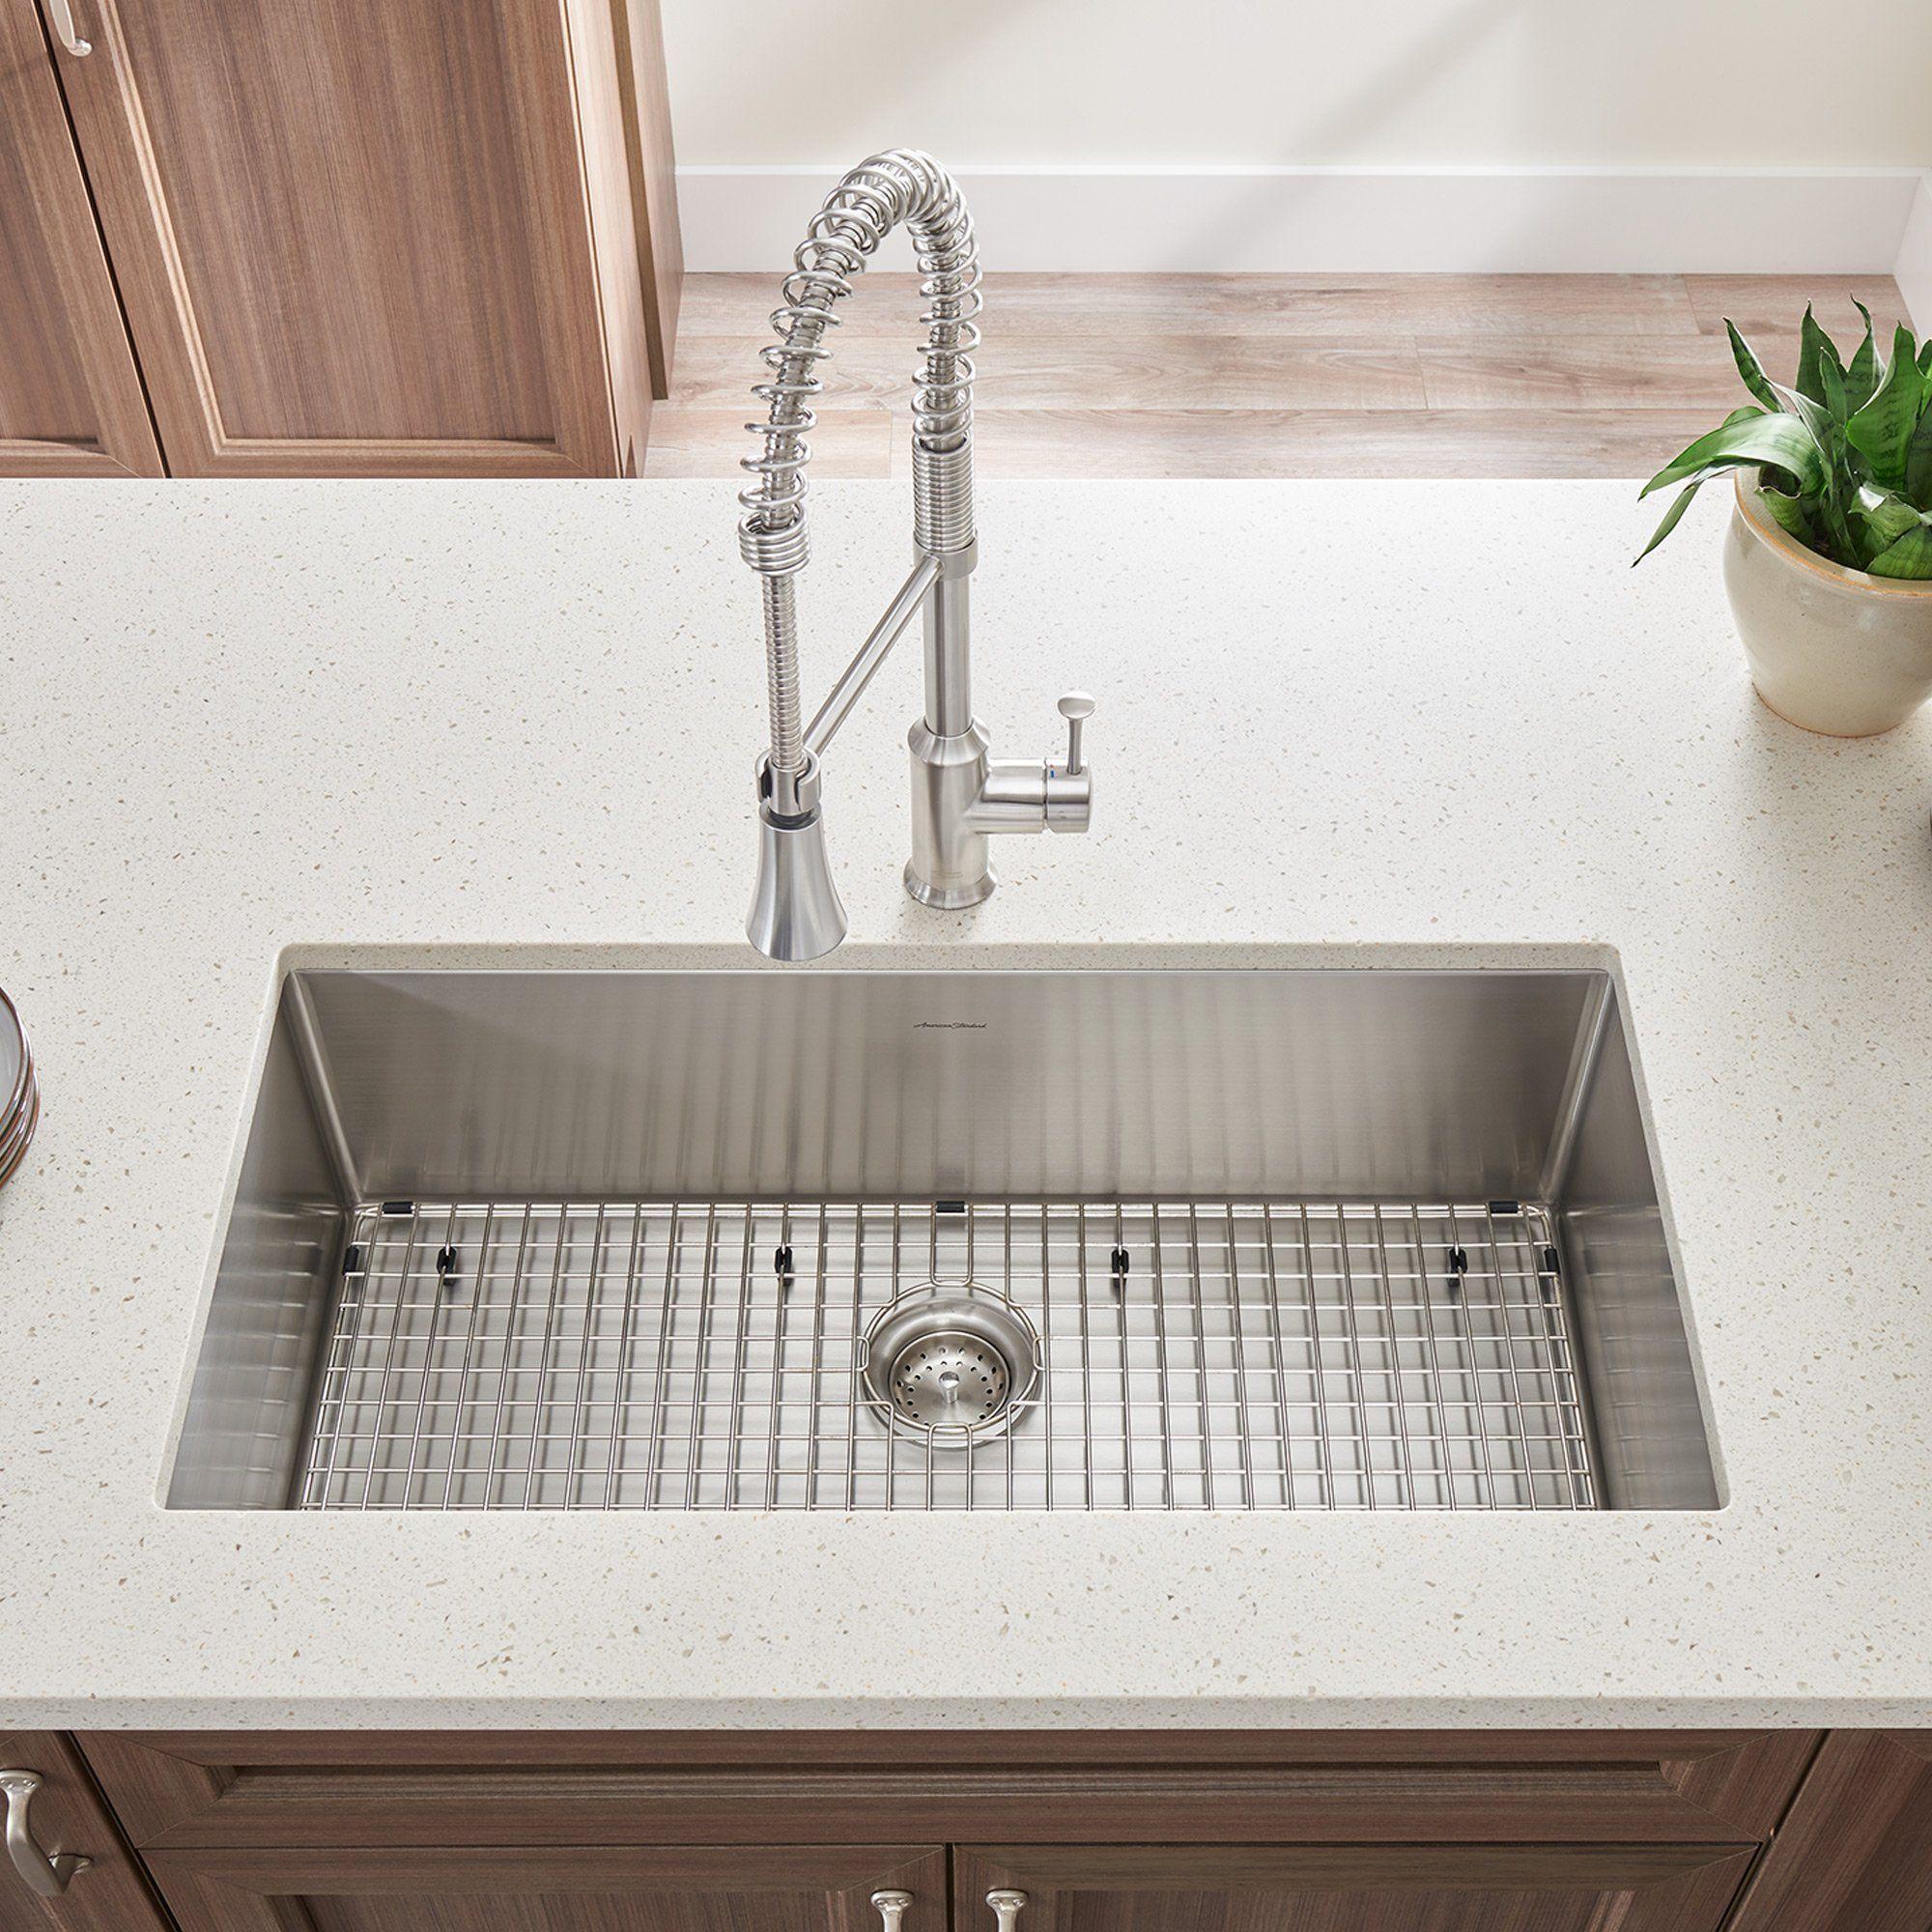 American Standard Pekoe 35x18 Stainless Steel Kitchen Sink With Drain And Bottom Grid 1 Undermount Kitchen Sinks Kitchen Sink Remodel Single Bowl Kitchen Sink